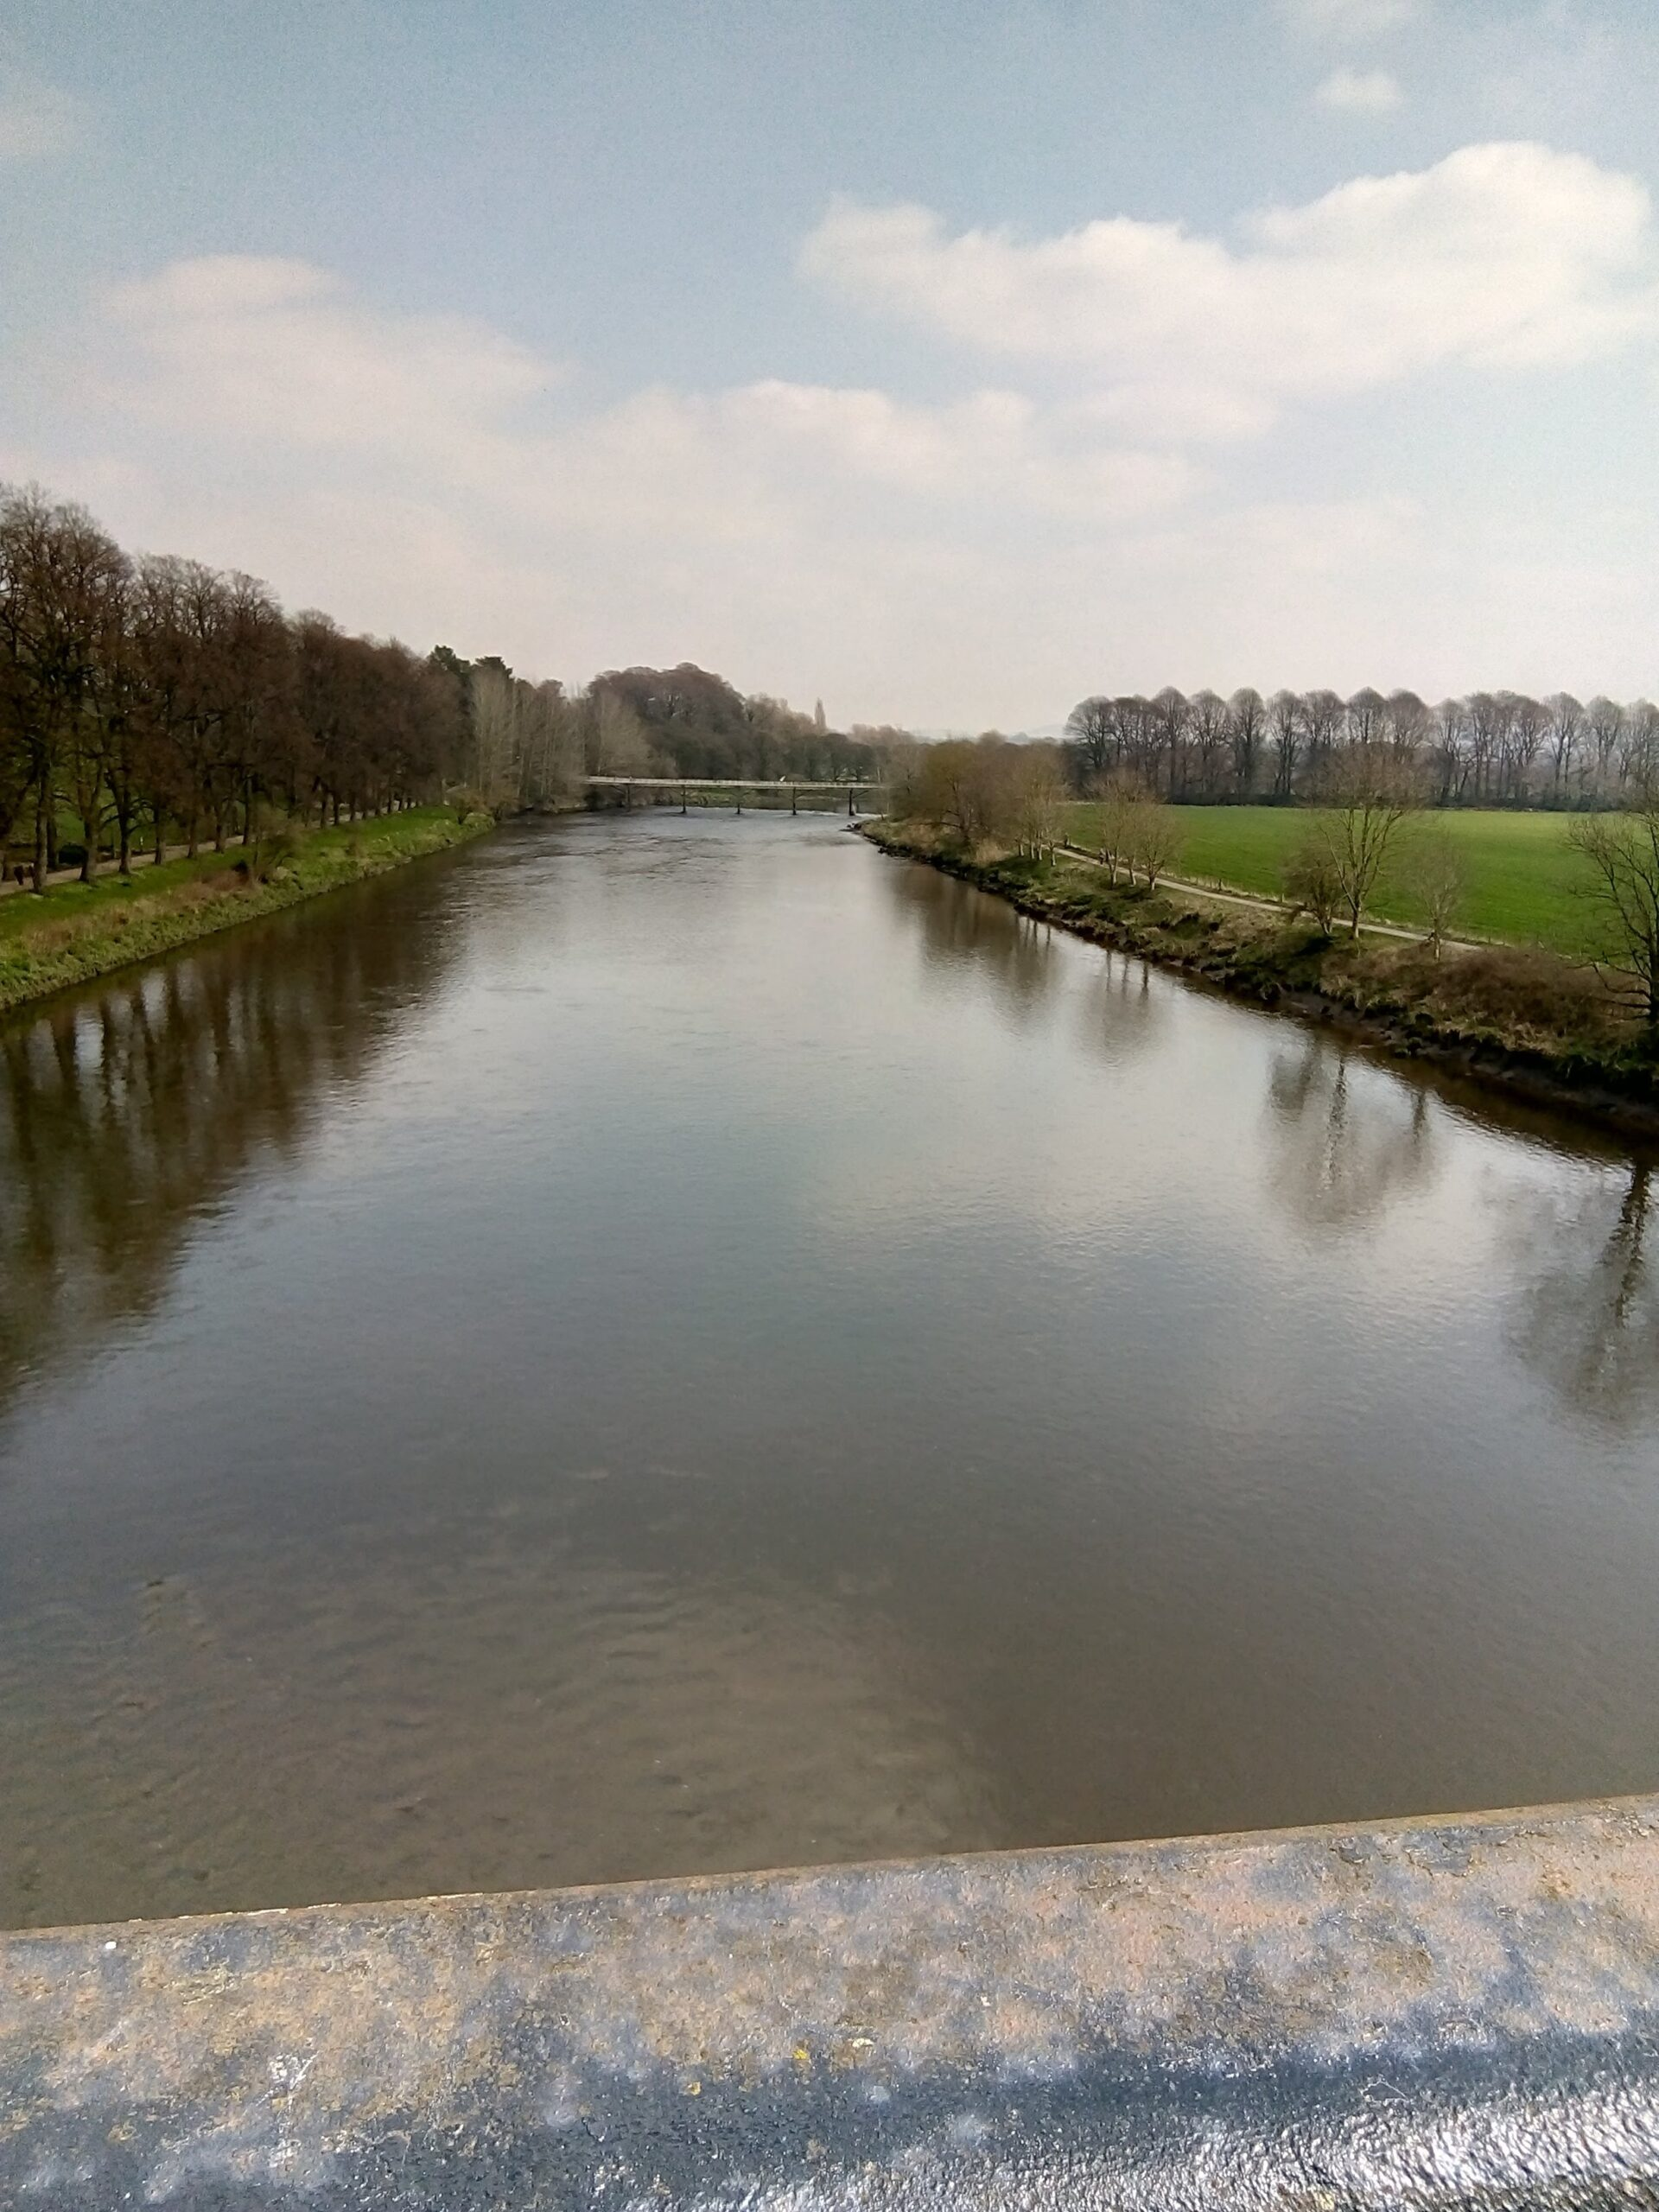 The Ribble by Avenham Park